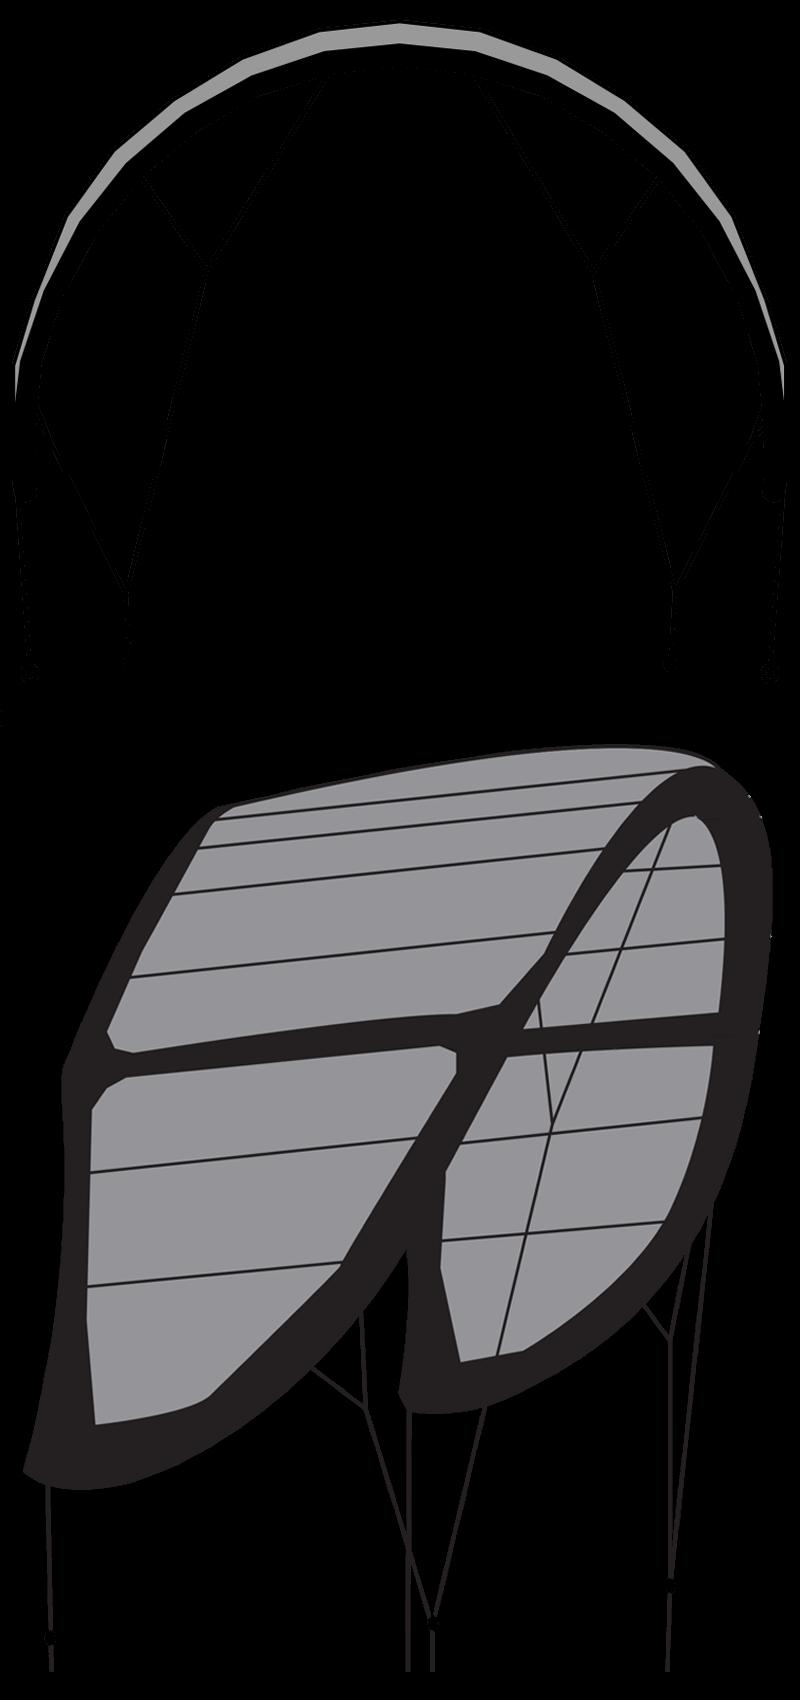 2 aile de kitesurf 2 lattes shape design